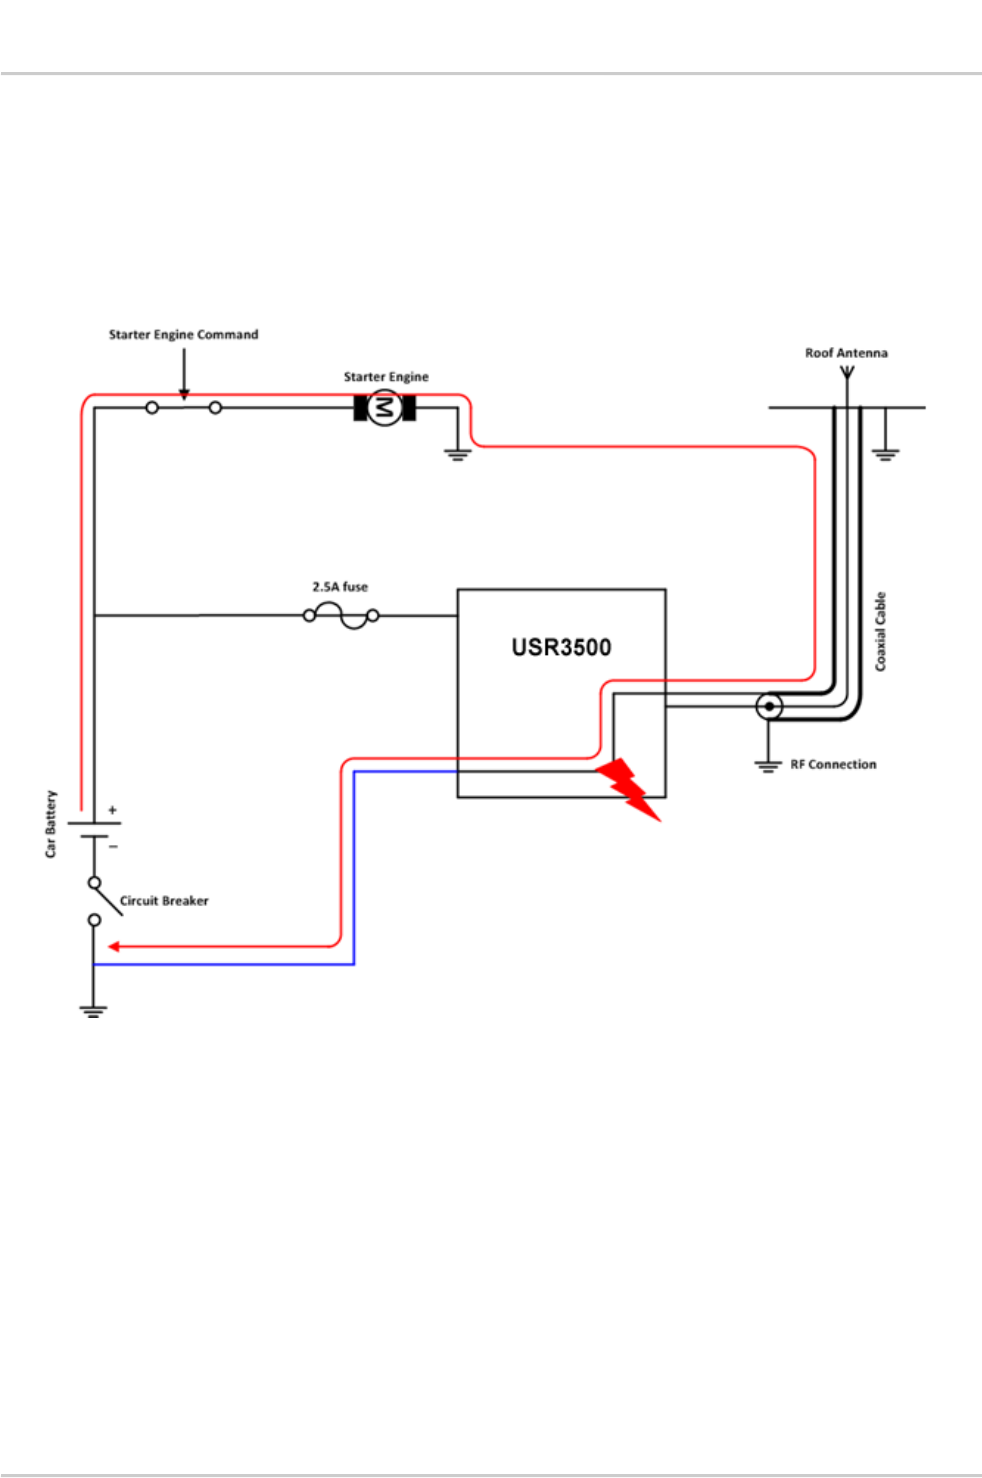 Jbl Reference Guide V1x 3500 Rg Unicom Circuit Breaker Twin Pack 16 99 Two Rev 10 1 27 14 49